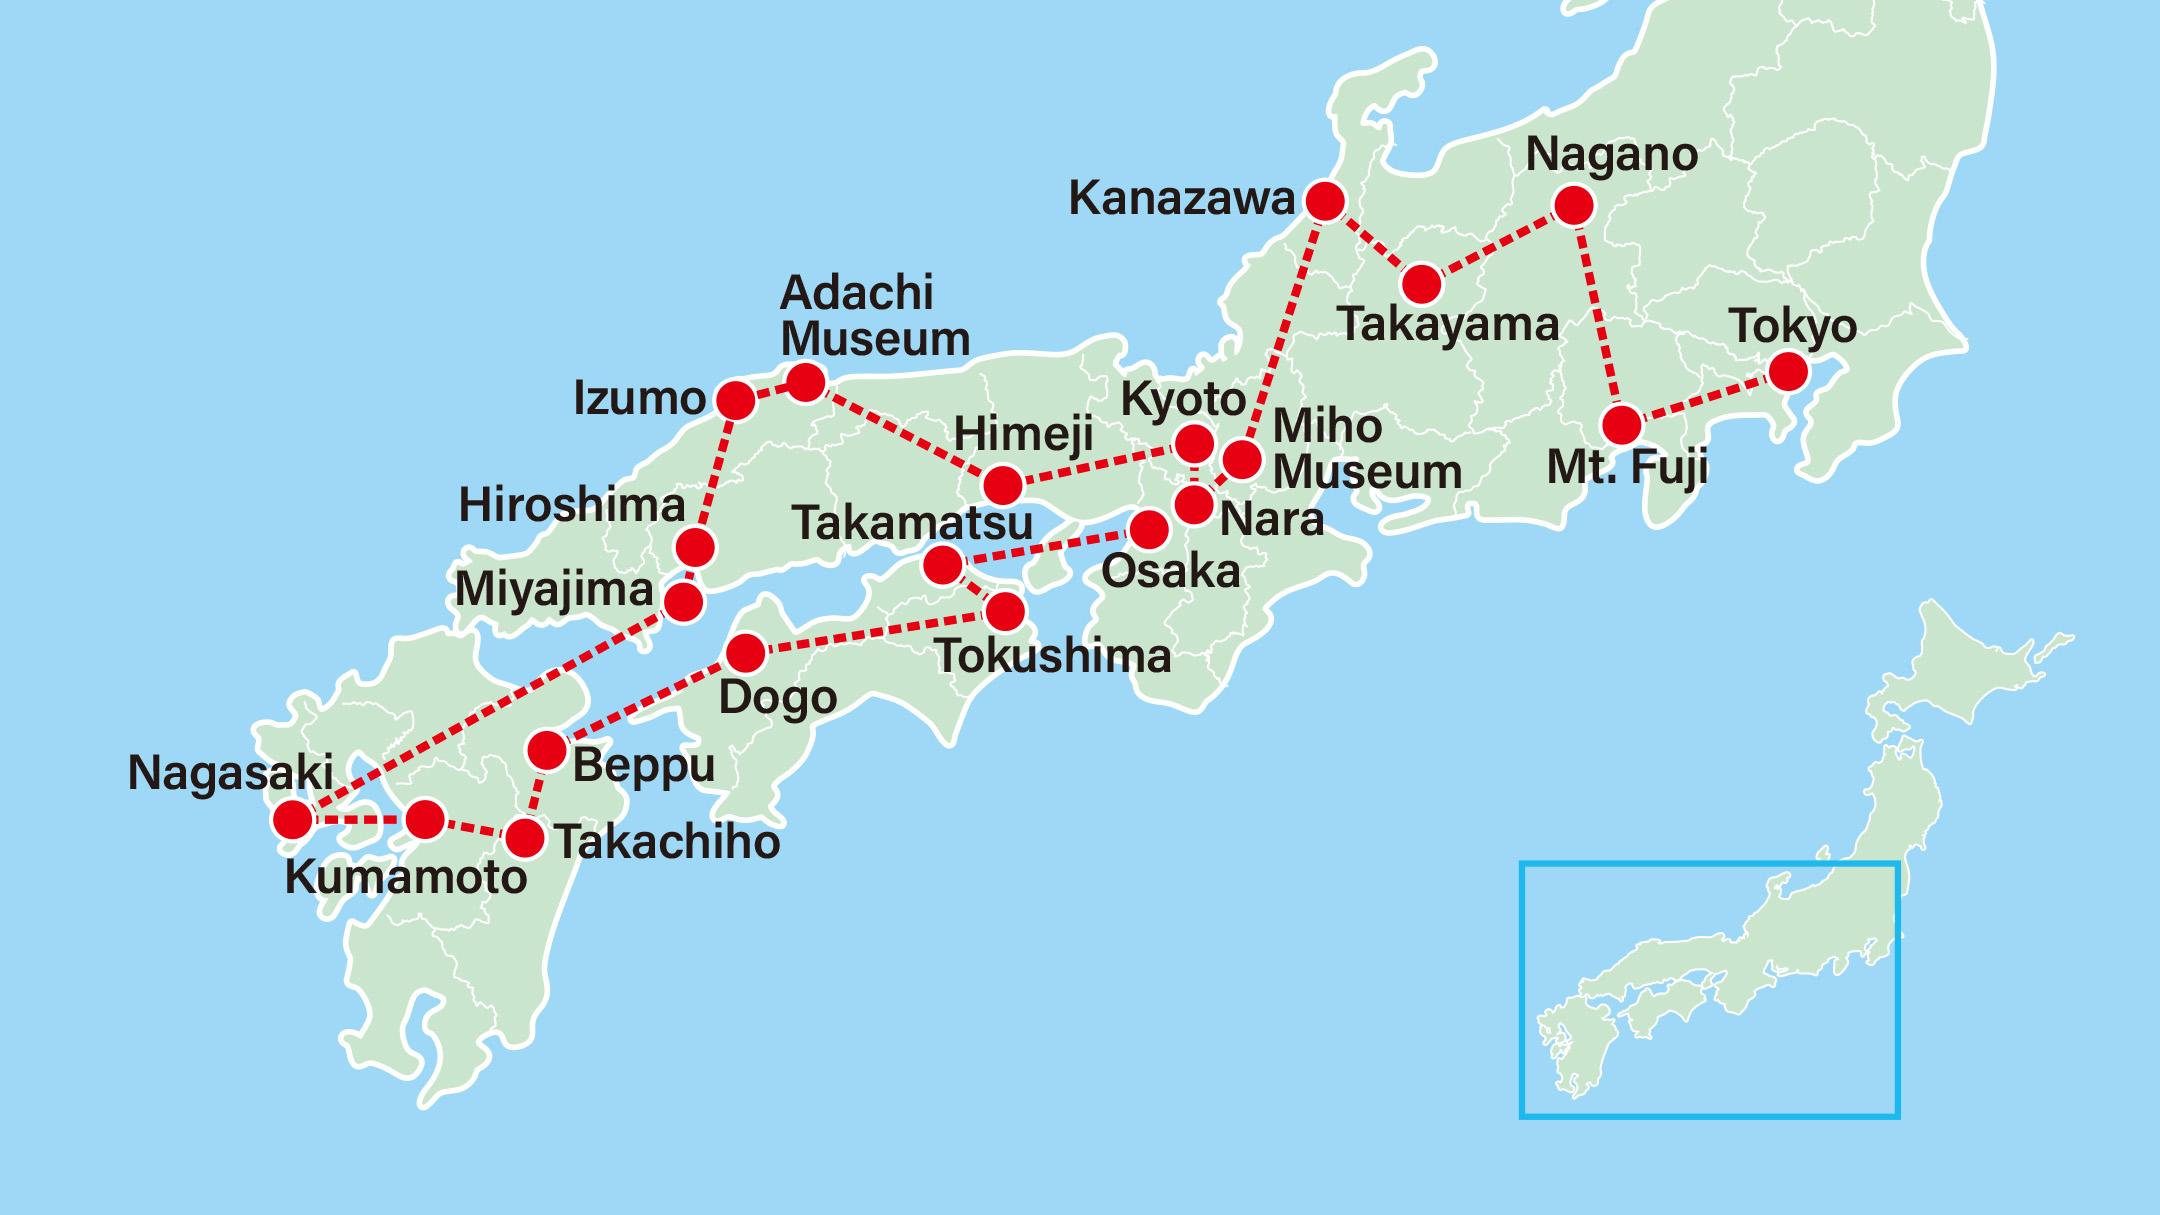 Takayama & Grand Tour of Japan 15 Days-Tokyo-Lake Kawaguchi-Nagano-Takayama-Kanazawa-Miho Museum-Nara-Kyoto-Himeji-Adachi Museum-Hiroshima-Miyajima-Nagasaki-Kumamoto-Takachiho-Beppu-Dogo-Tokushima-Ritsurin Garden-Osaka